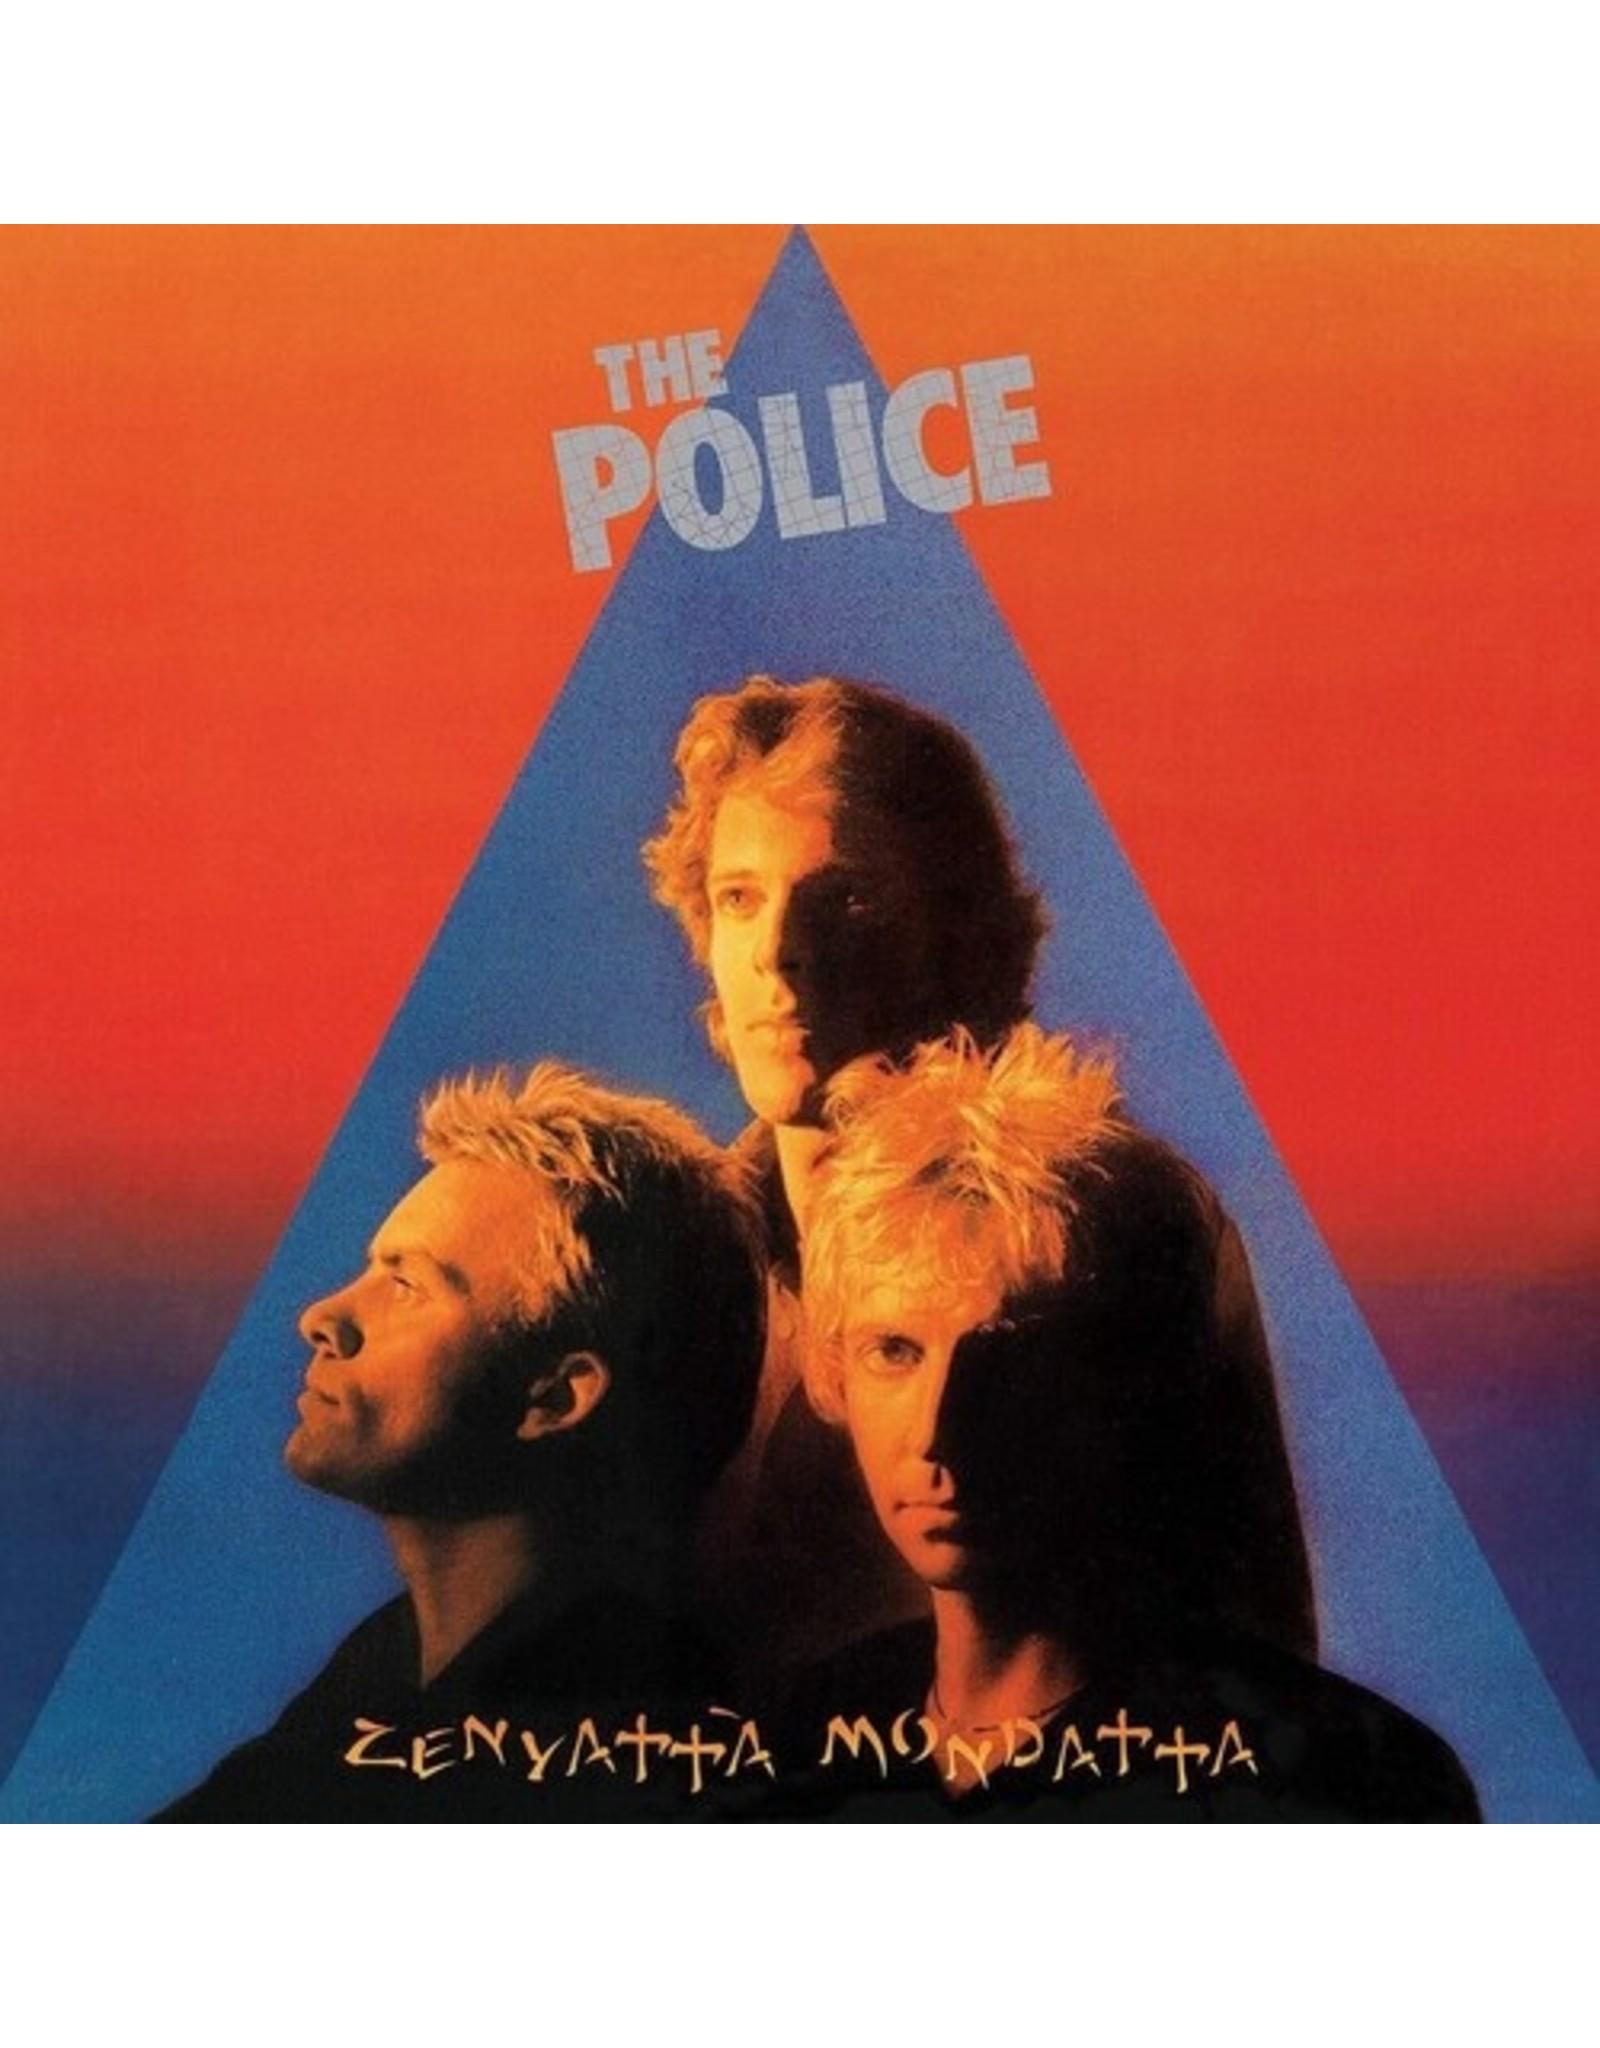 New Vinyl The Police - Zenyatta Mondatta LP